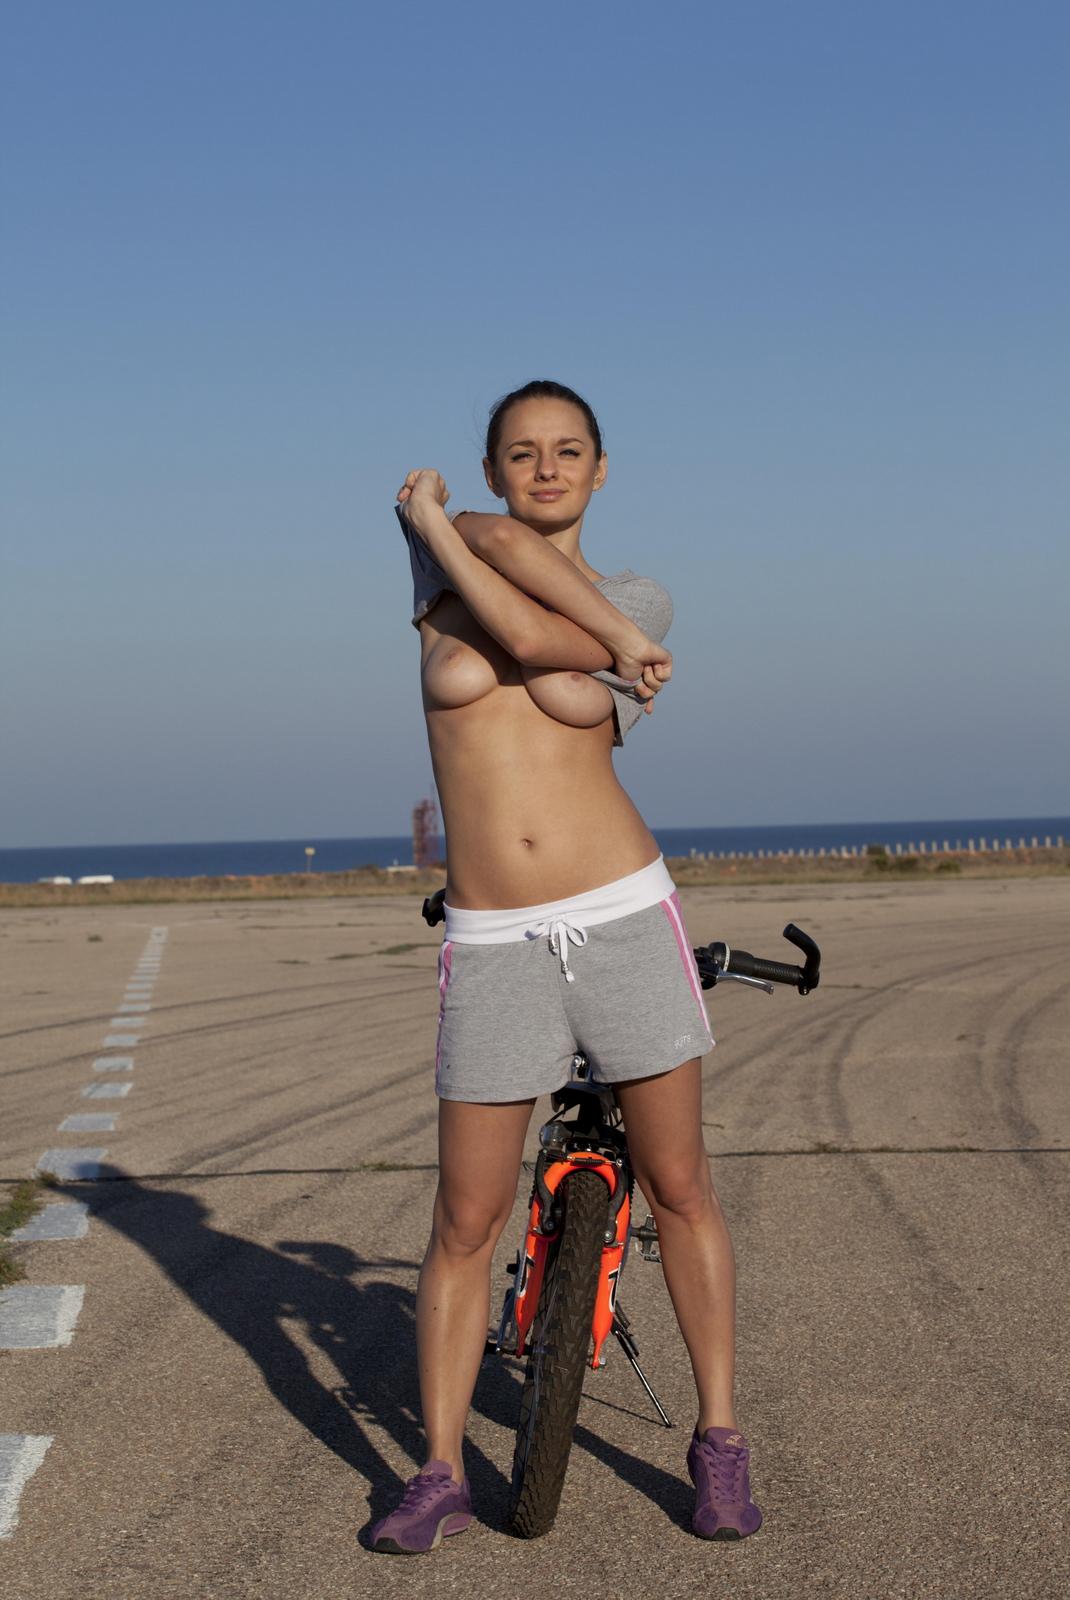 mishel-c-bicycle-boobs-naked-domai-04